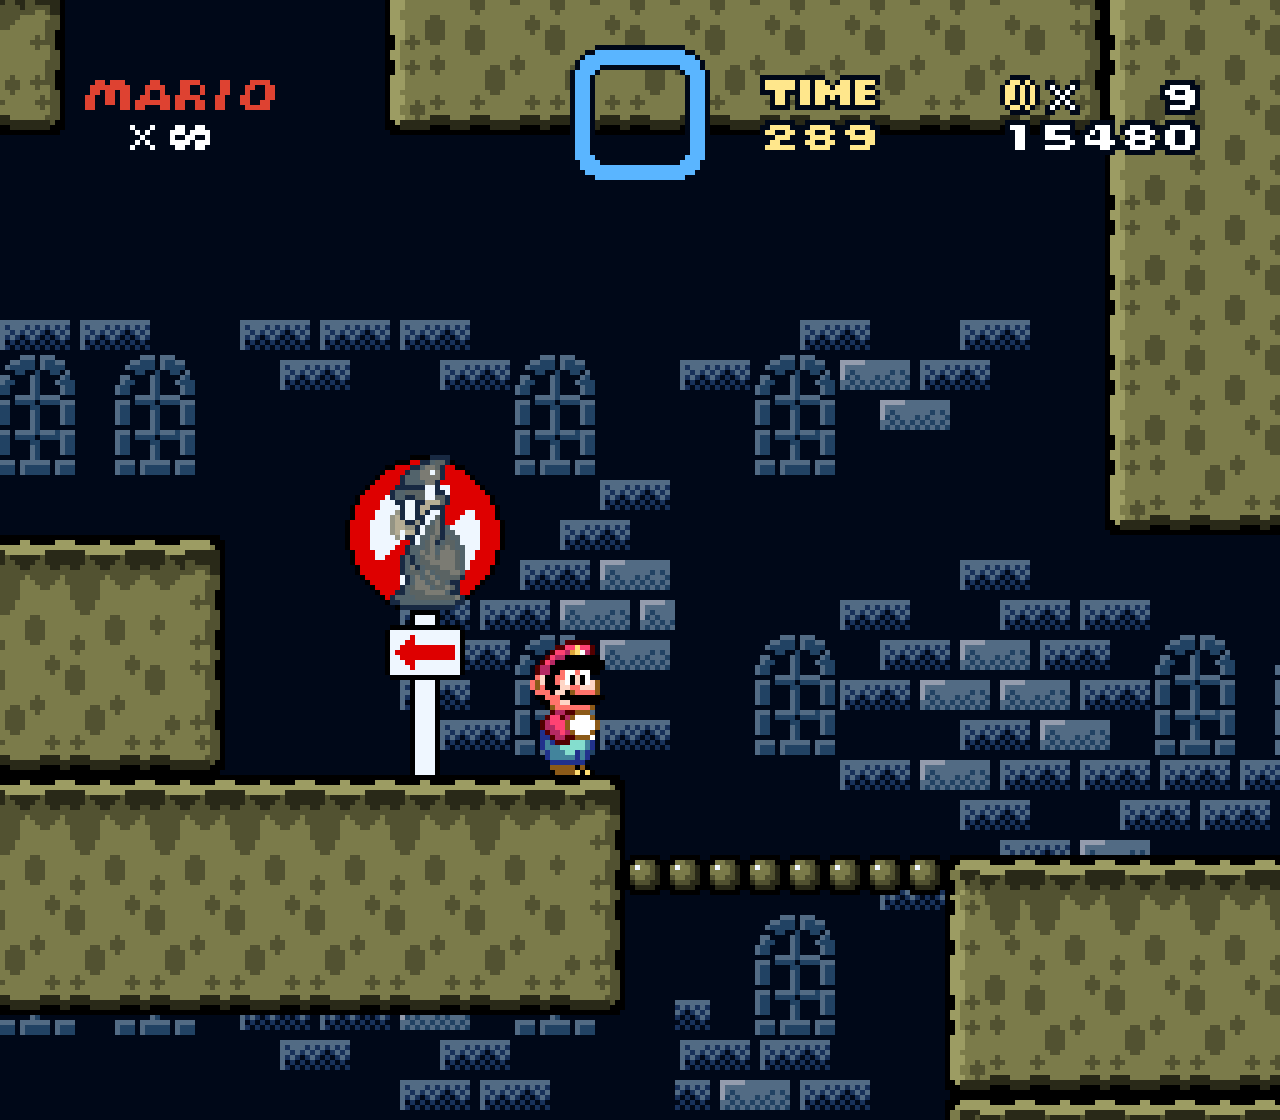 ZMZ video game emulator